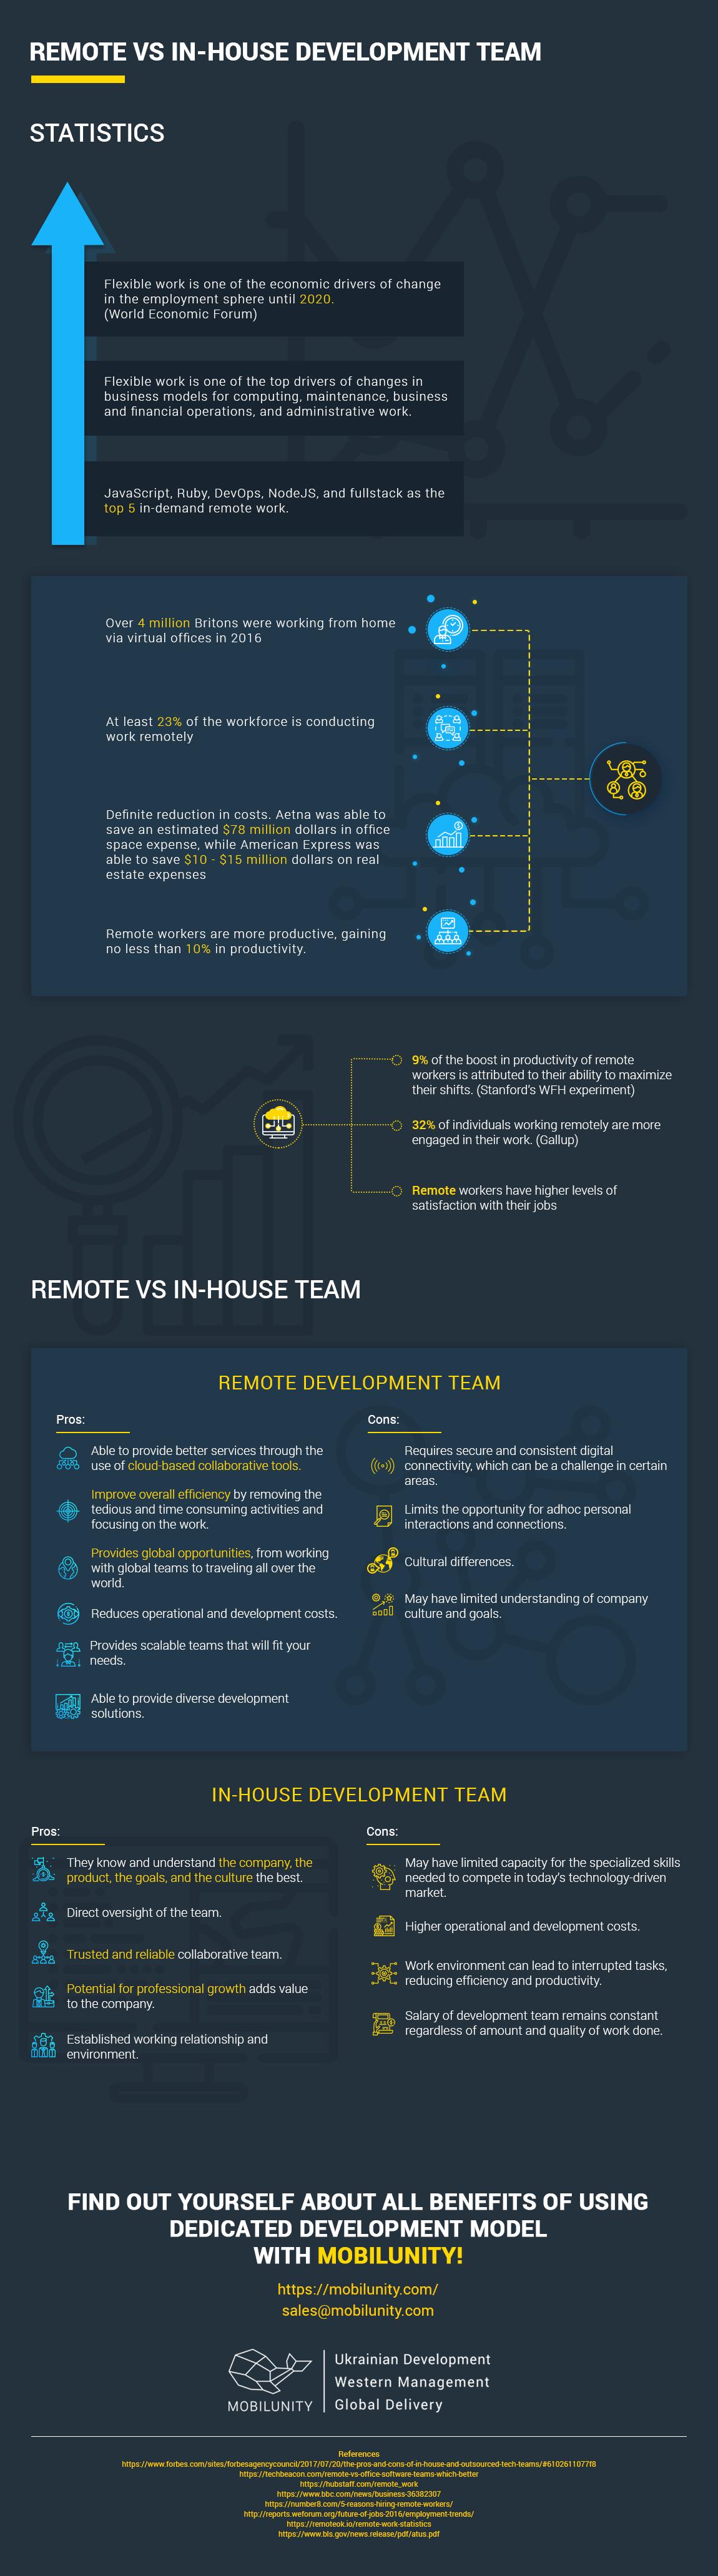 Remote vs In-House Development Teams